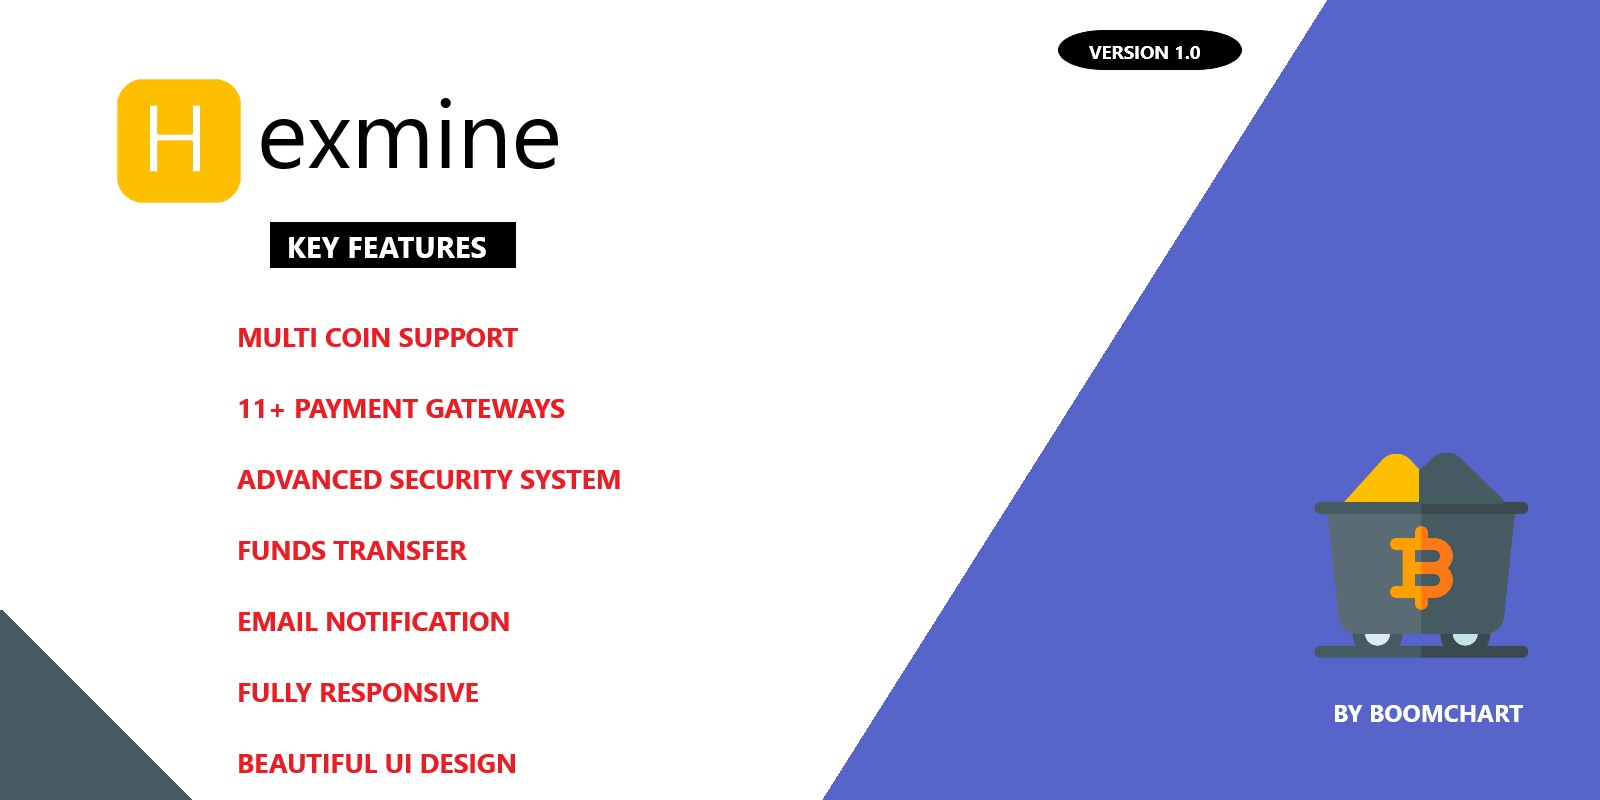 Hexmine Cloudmining PHP Script